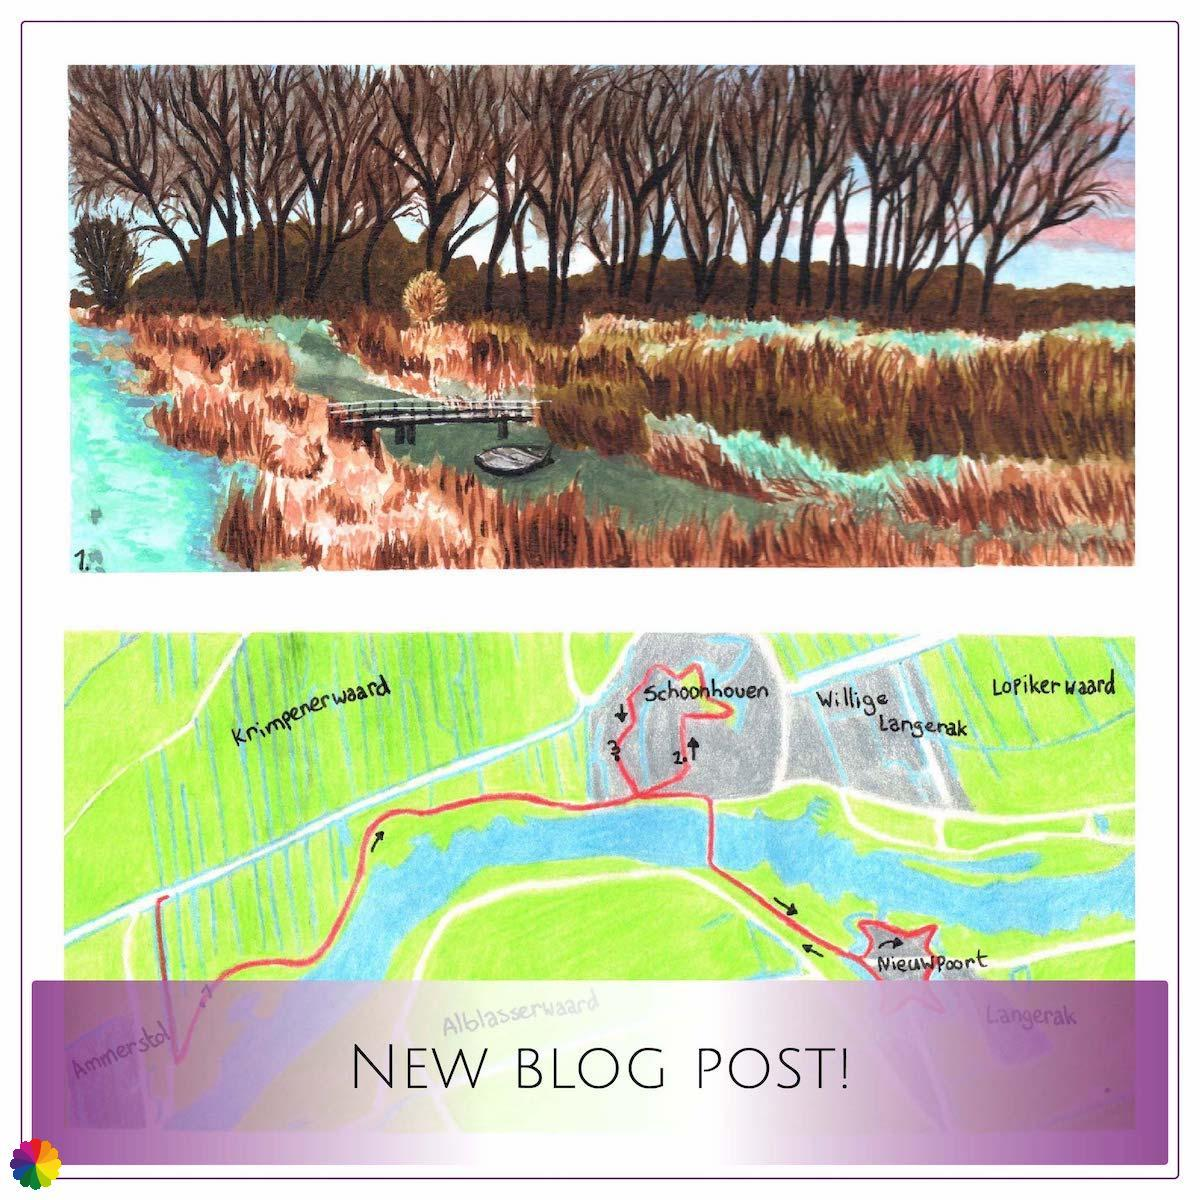 Blog-update Grote rivierenpad Ammerstol - Nieuwpoort